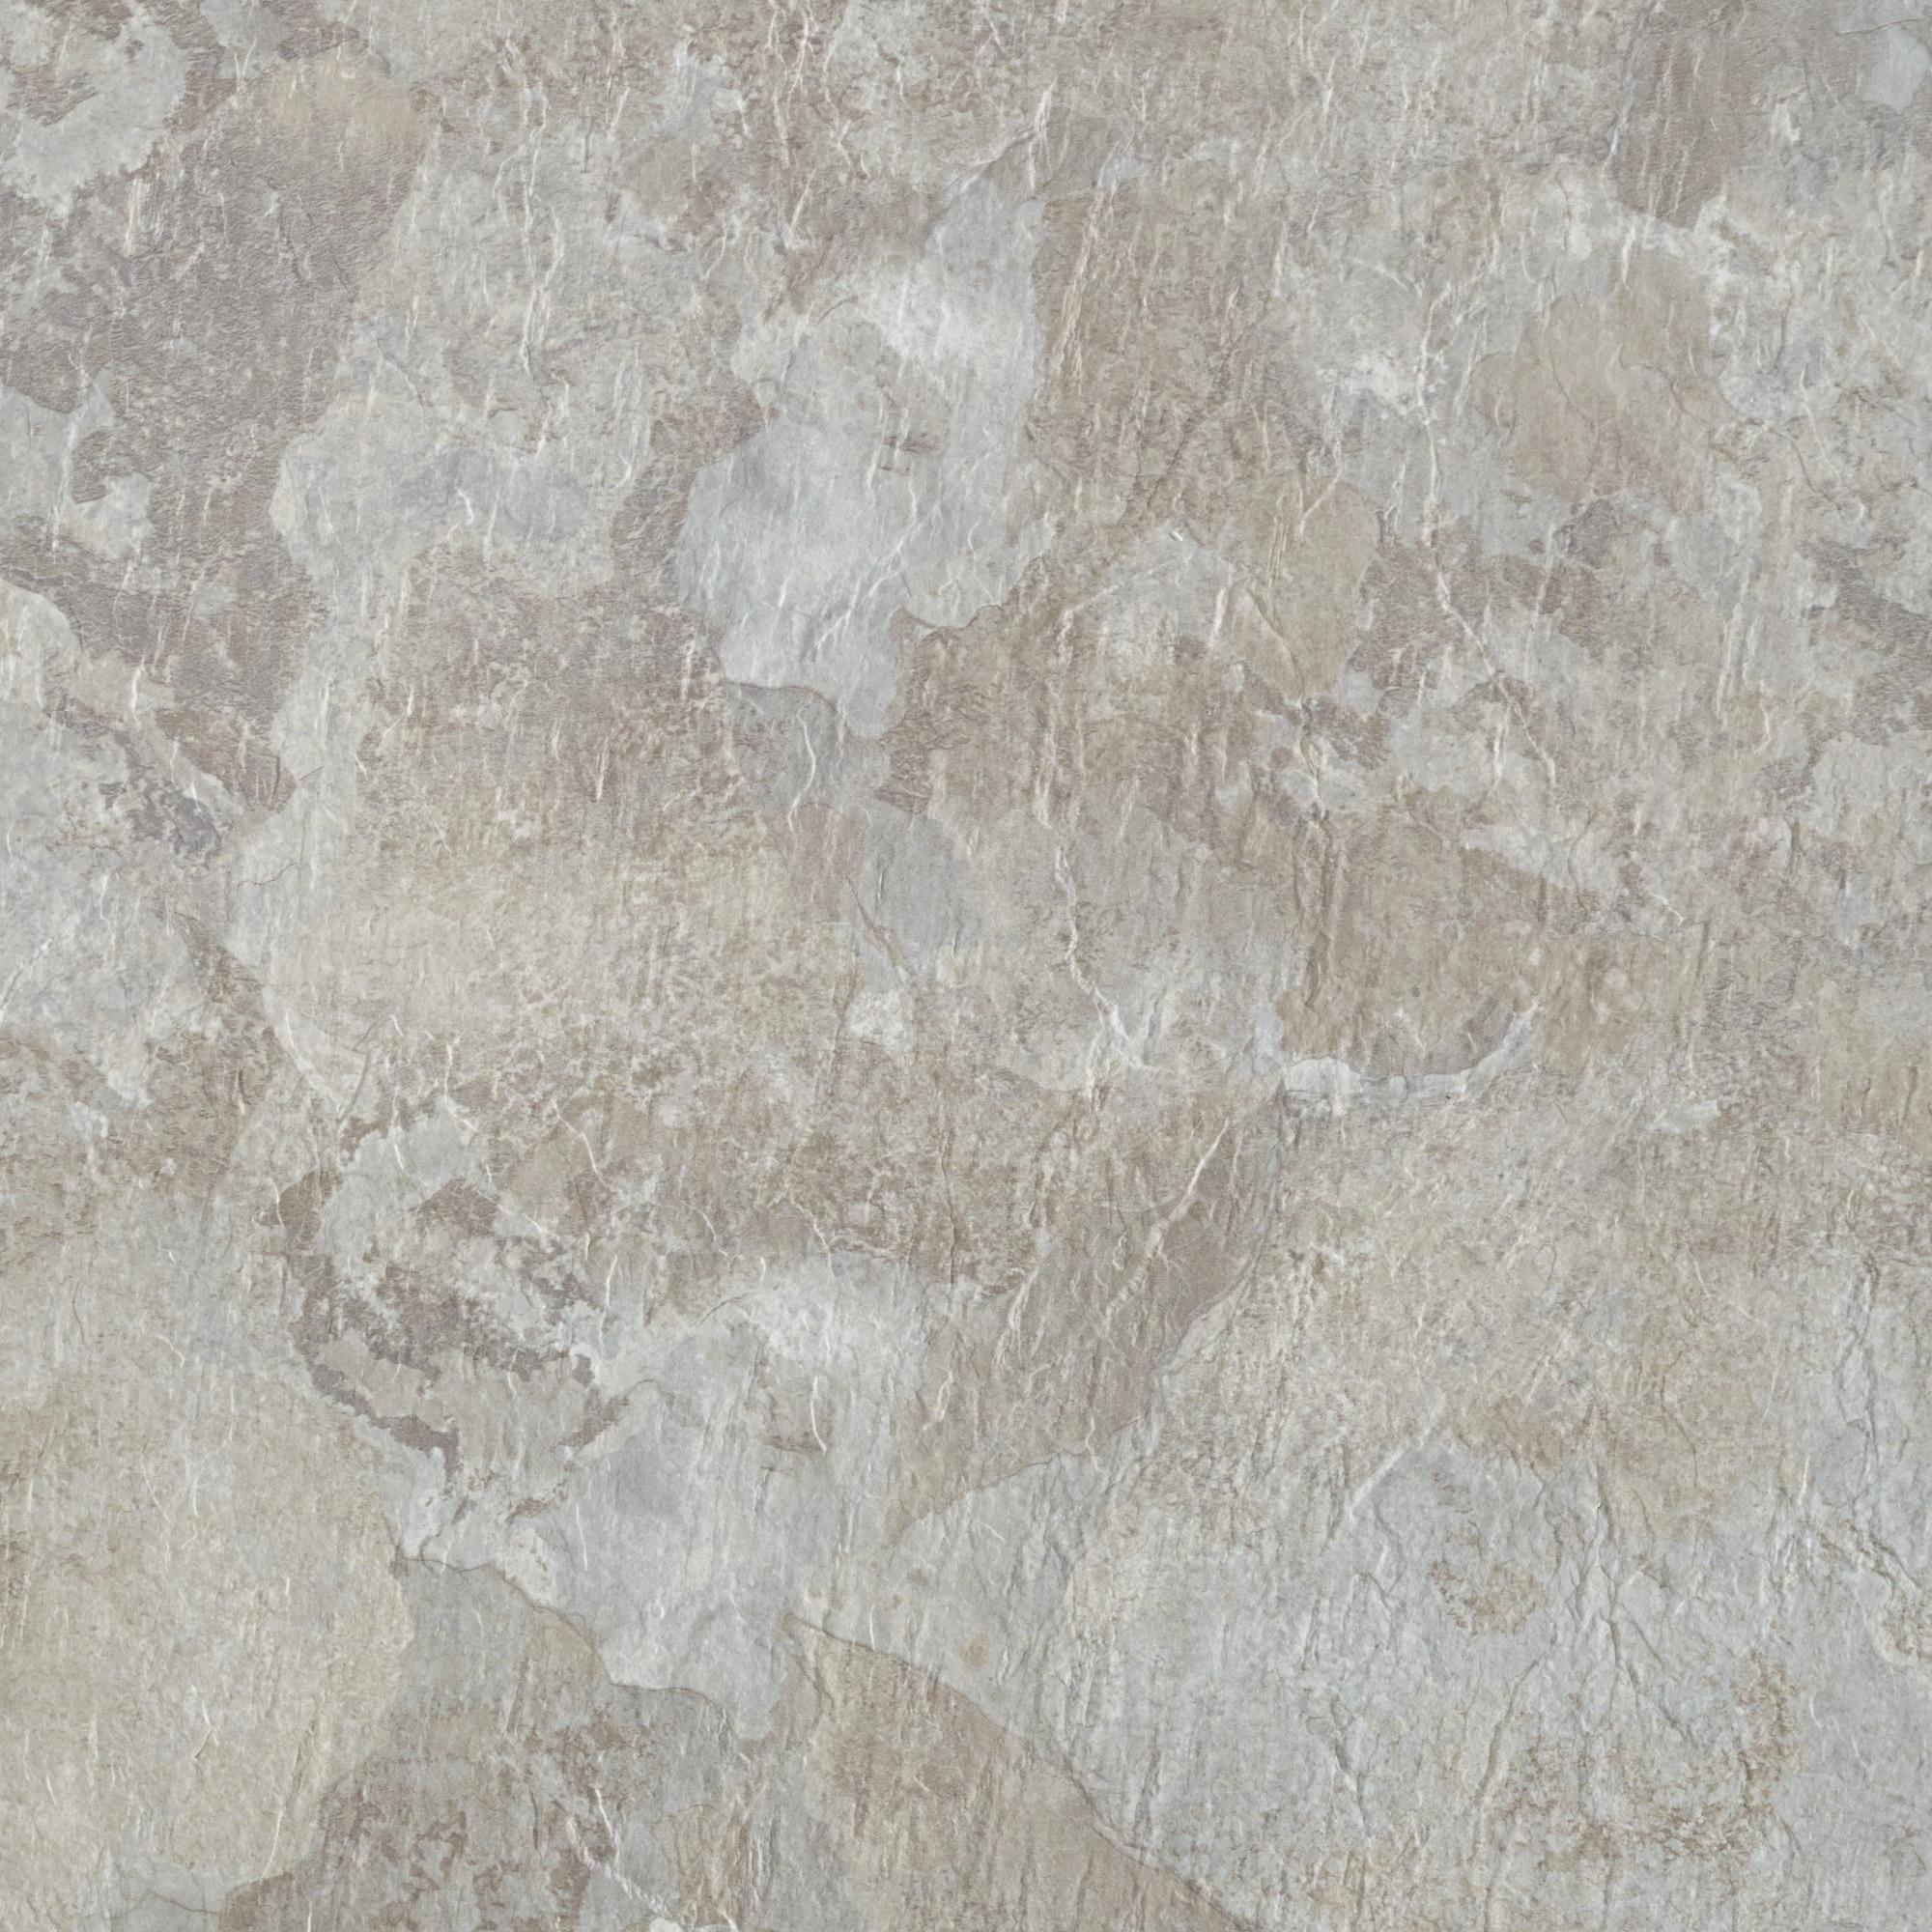 Shop Achim Majestic Light Gray Slate 18x18 Self Adhesive Vinyl Floor